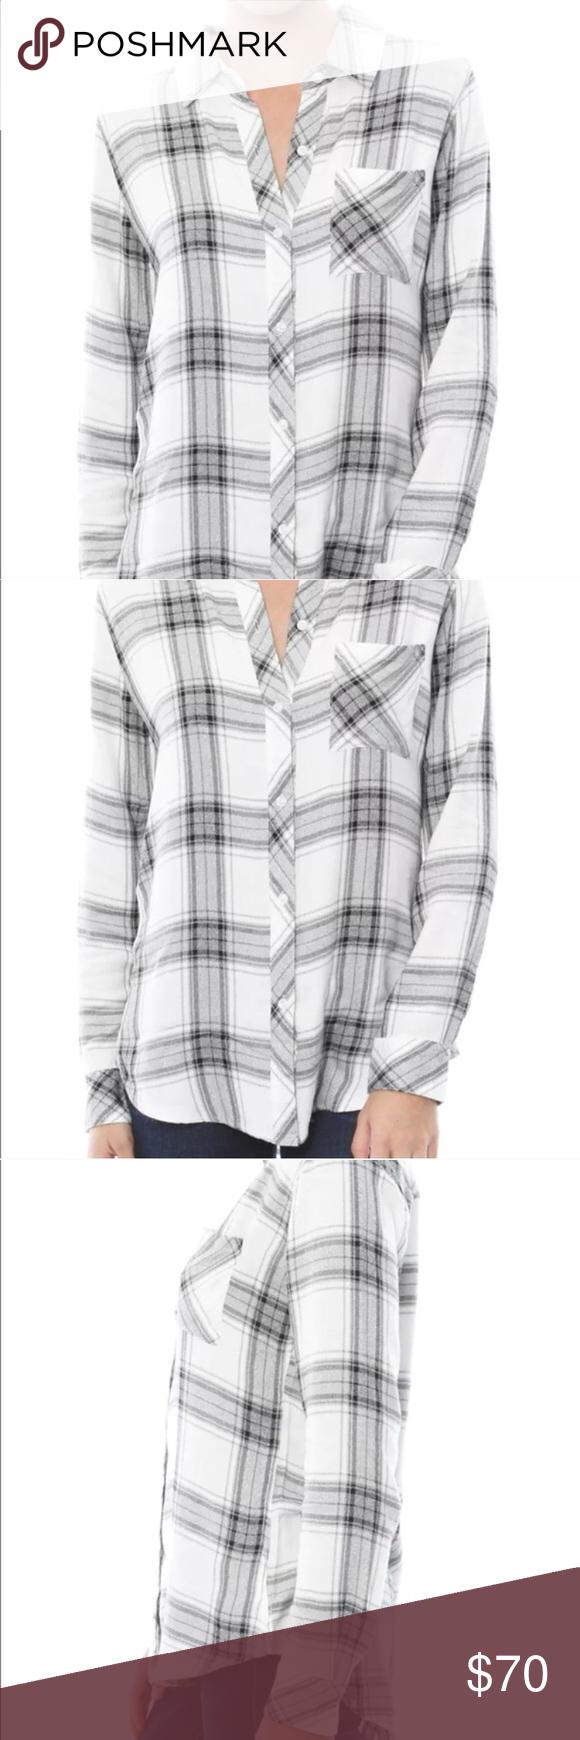 Rails Hunter Plaid Shirt in WhiteAsh Gray XS